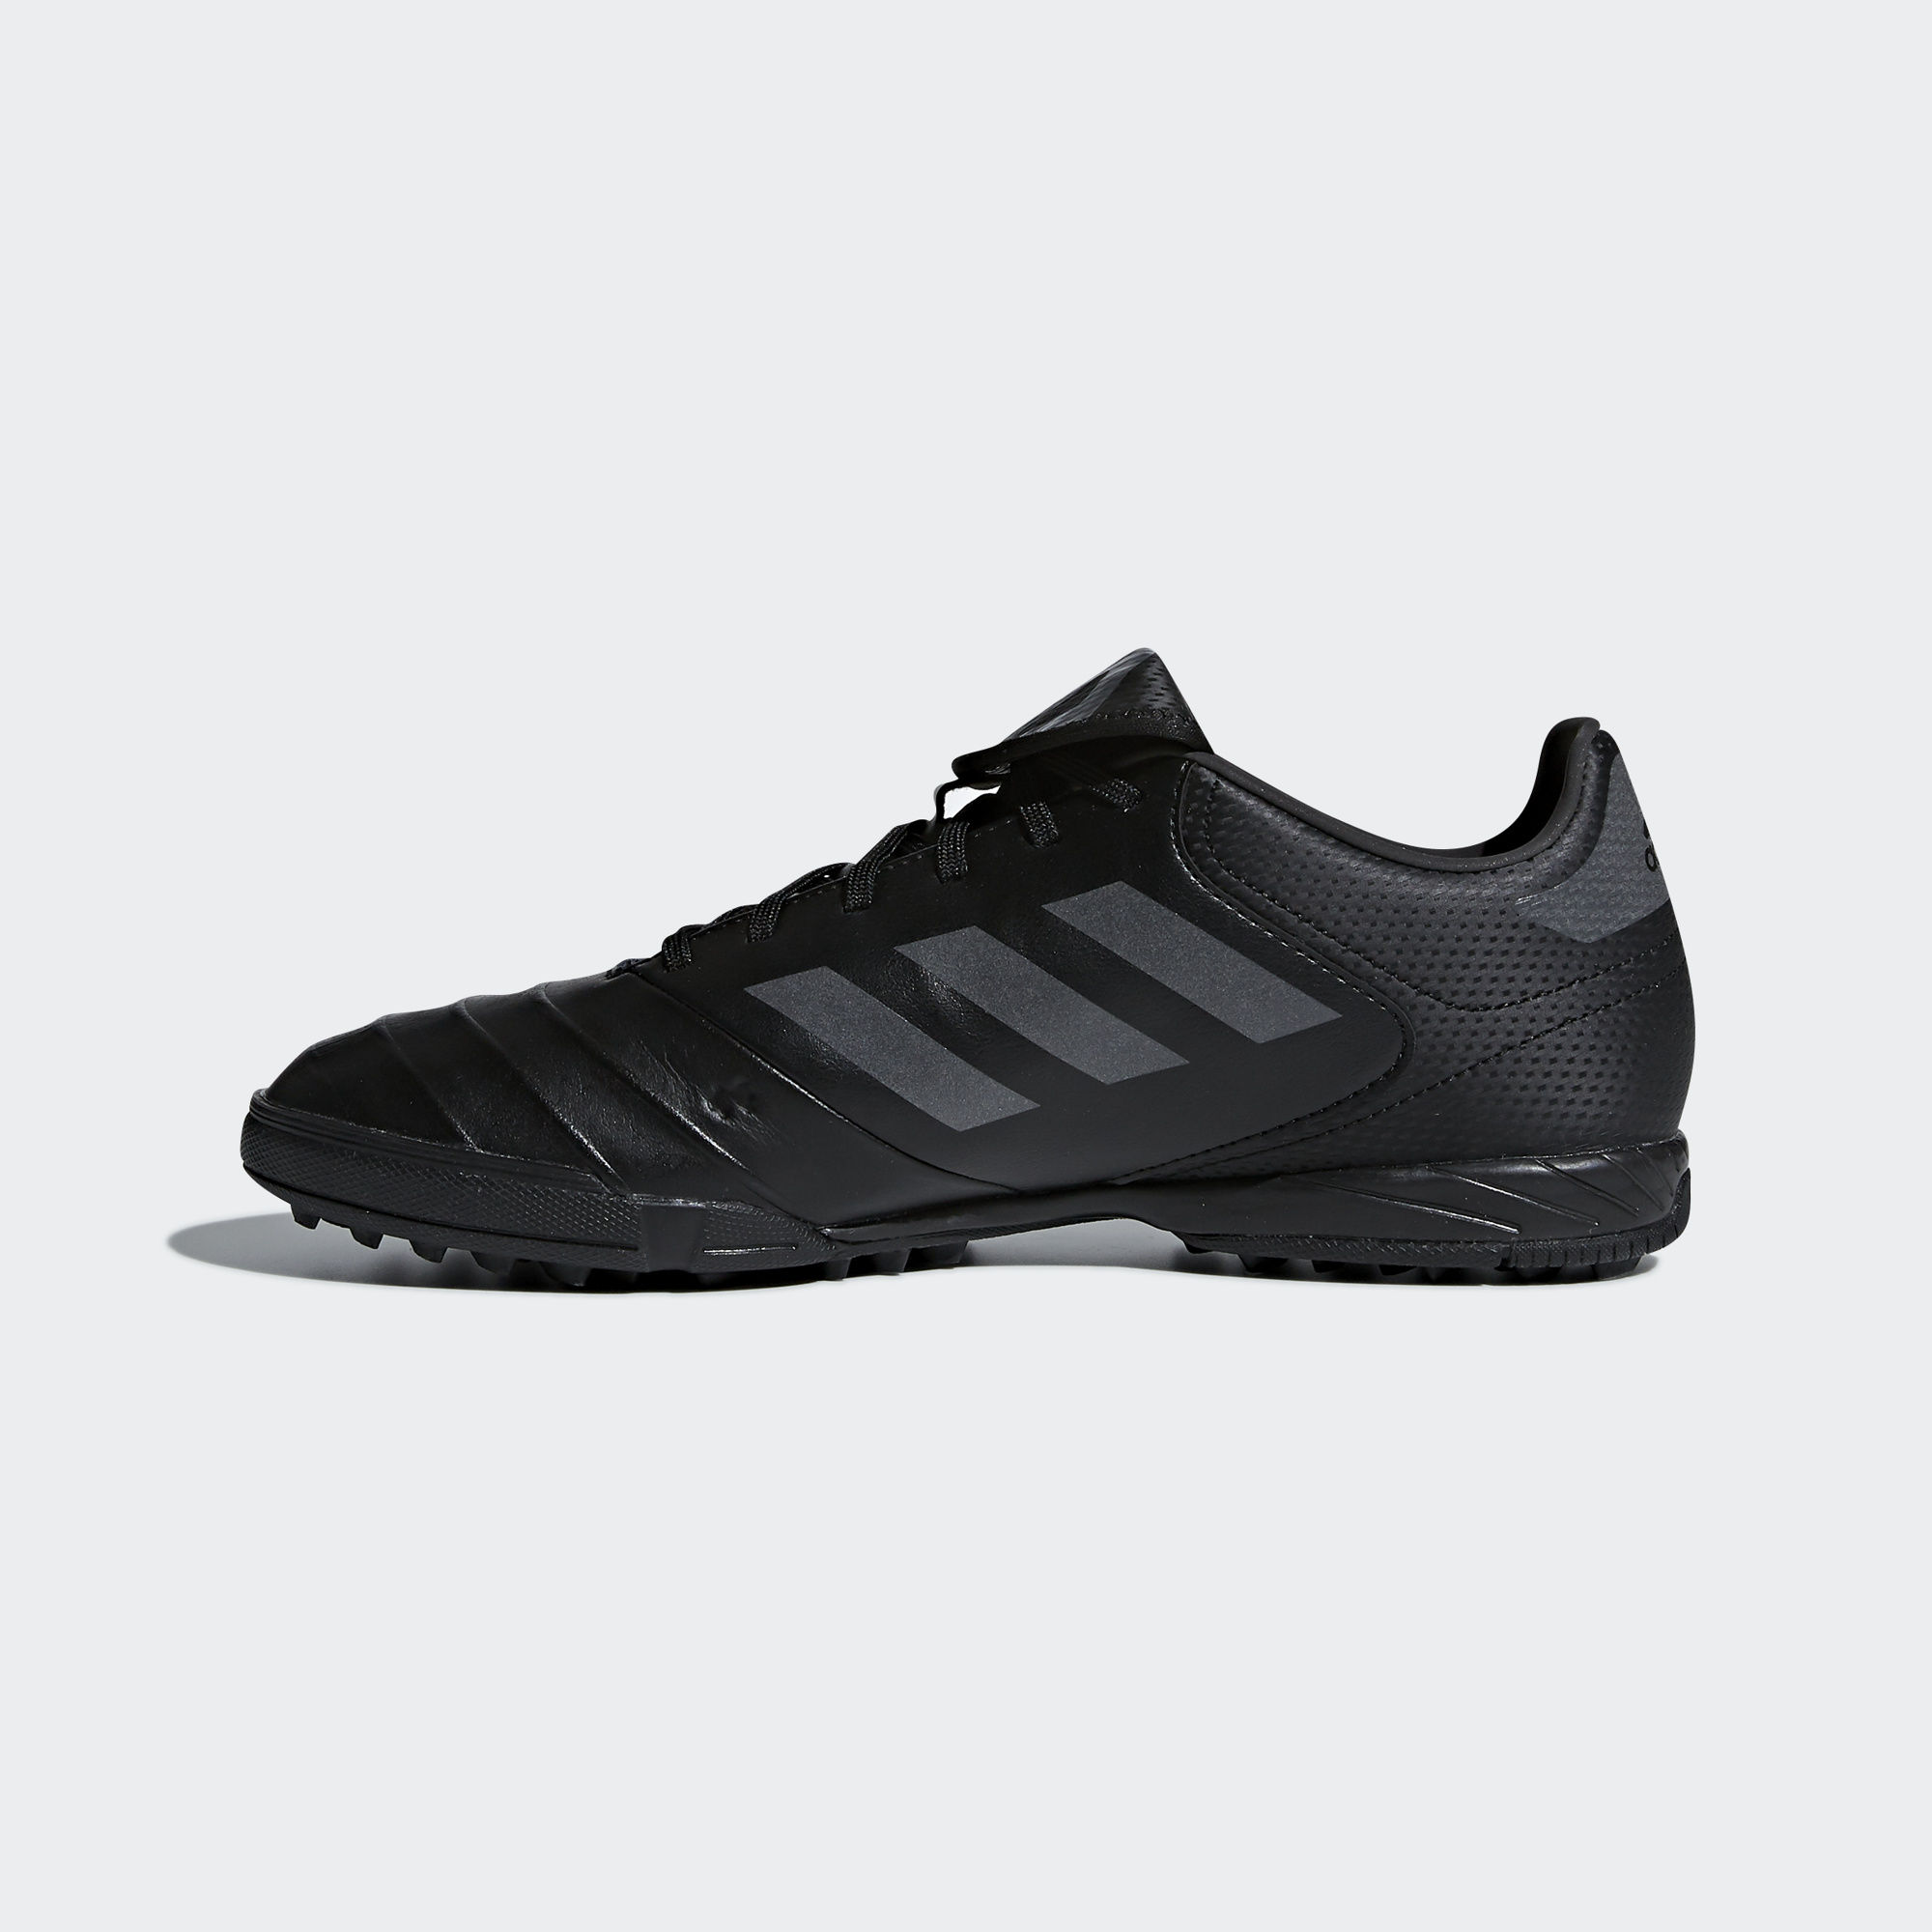 390c33558745 ... Click to enlarge image  adidas_copa_tango_18.3_tf_nite_crawler_core_black_utility_black_core_black_g.jpg  ...